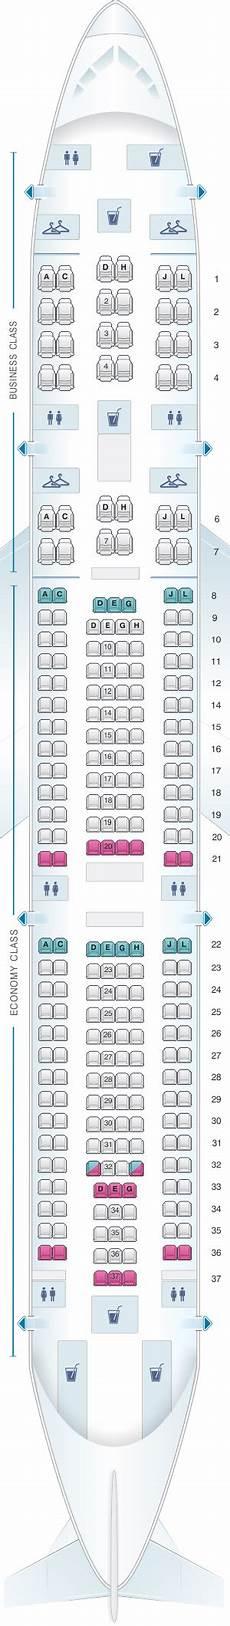 Iberia 2622 Seating Chart Mapa De Asientos Iberia Airbus A340 300 Plano Del Avi 243 N